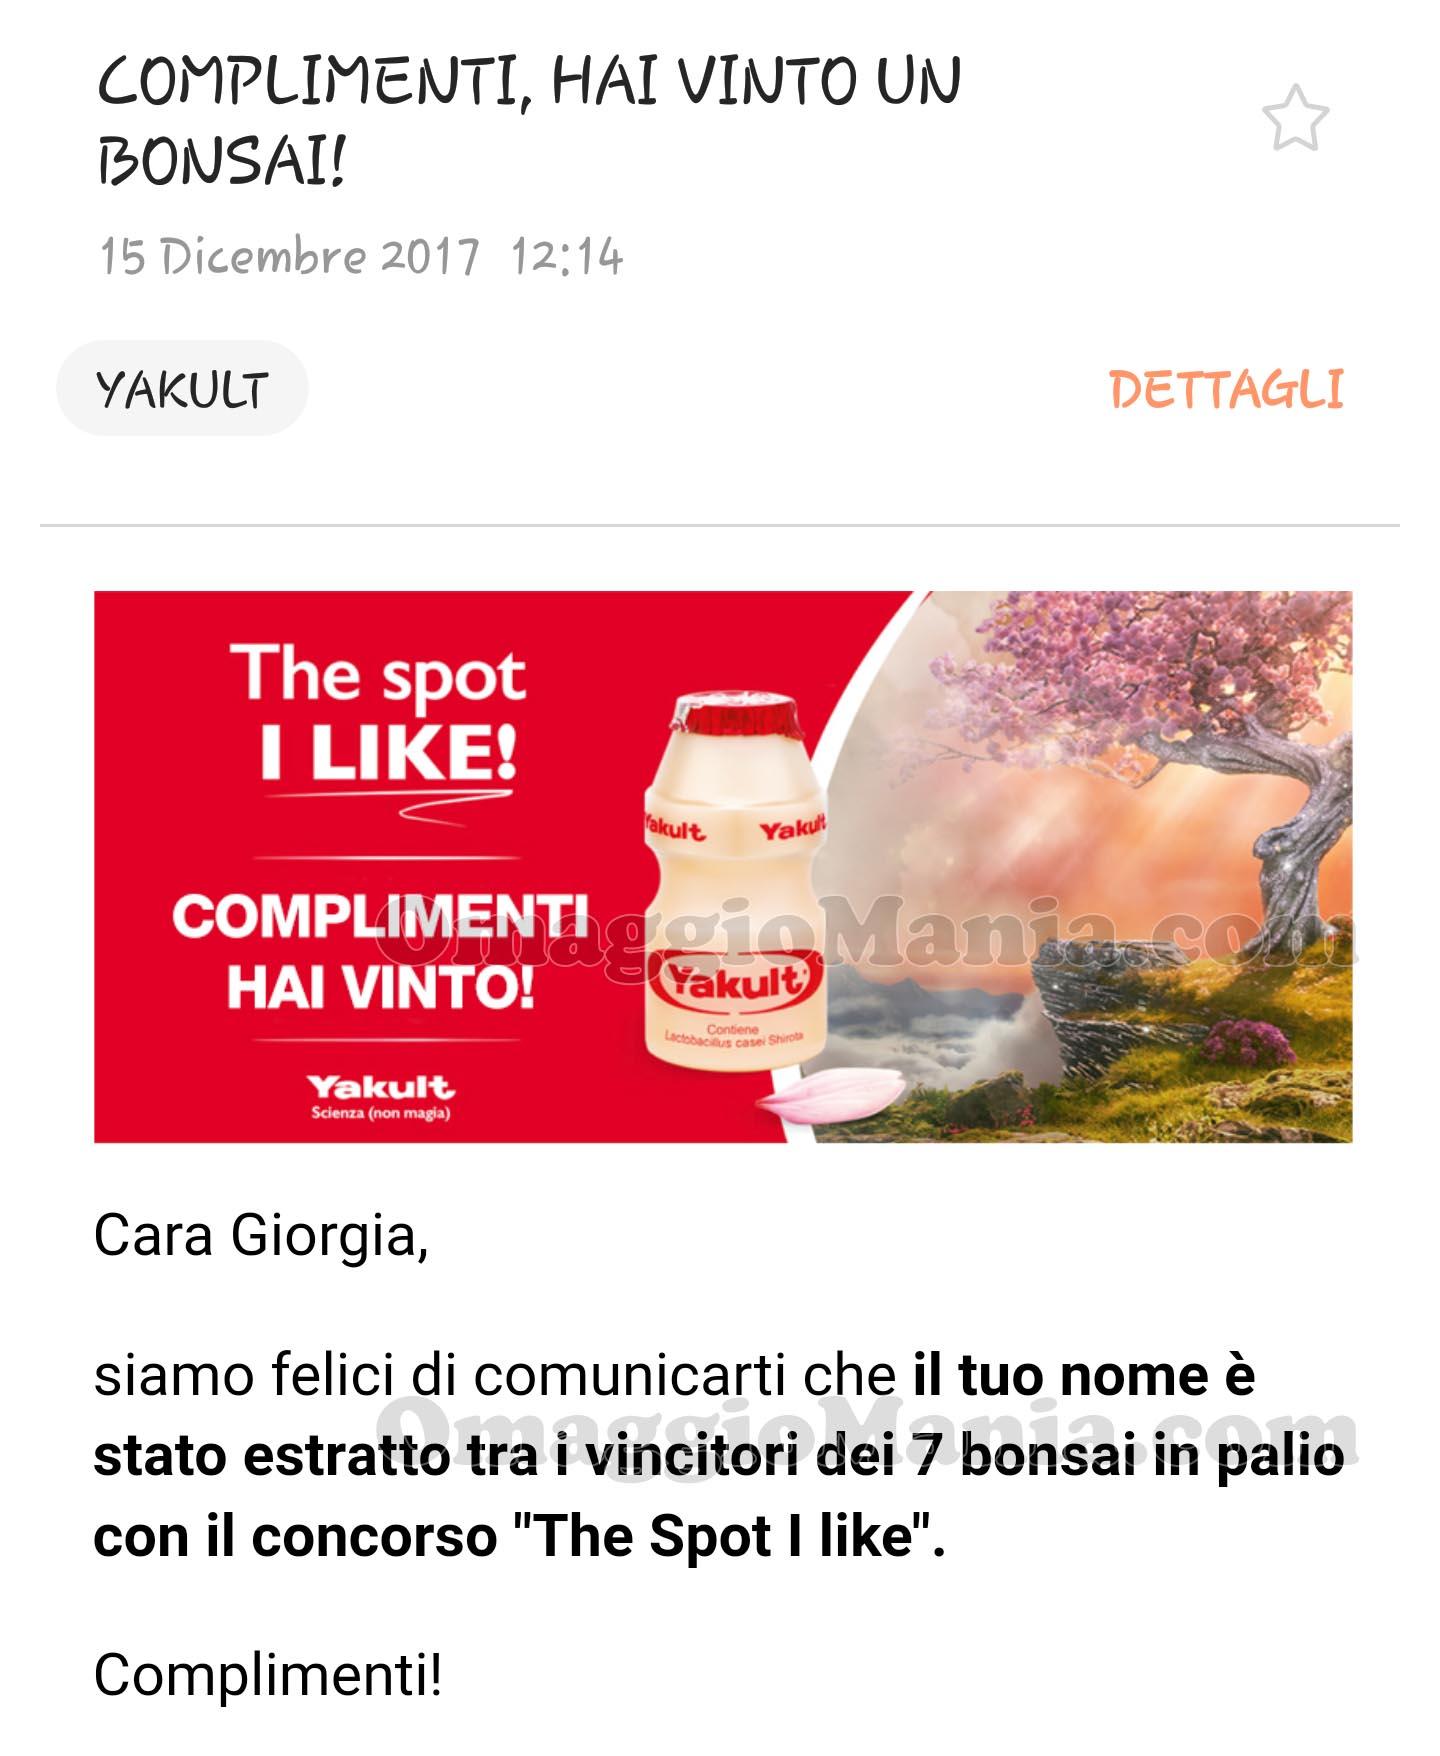 comunicazione vincita Bonsai Yakult The Spot I like di Giorgia